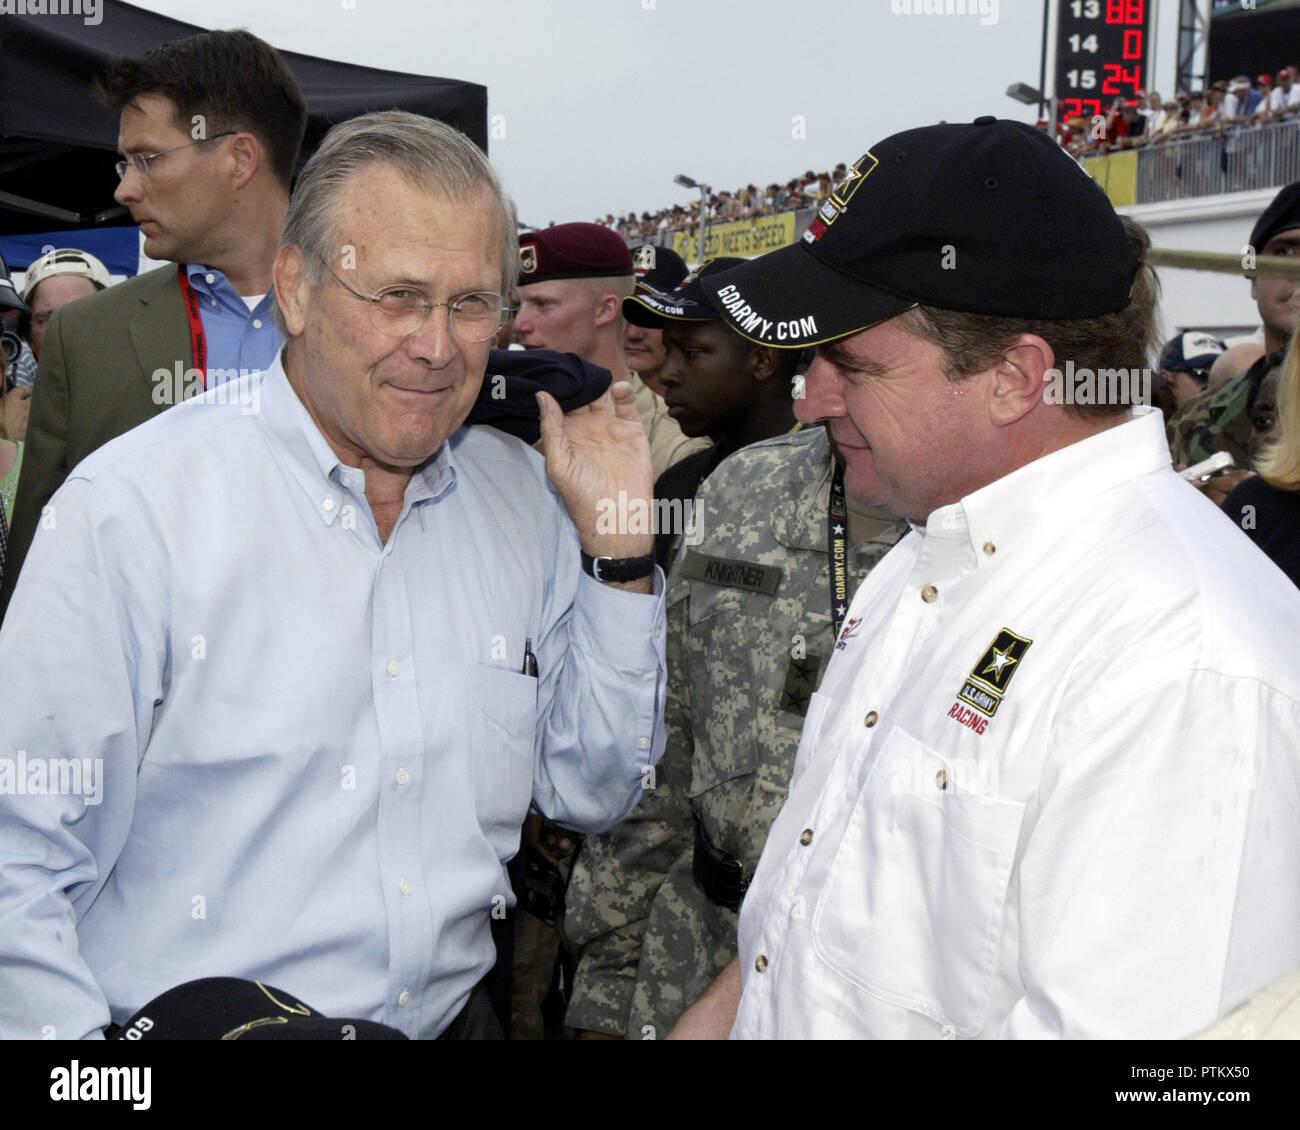 Secretary of Defense Donald Rumsfeld talks with Army sponcered driver Joe Nemechek in the garages prior to the running of the NASCAR Pepsi 400 , at Daytona International Speedway in Daytona Beach,  Florida, on July 2, 2005. - Stock Image